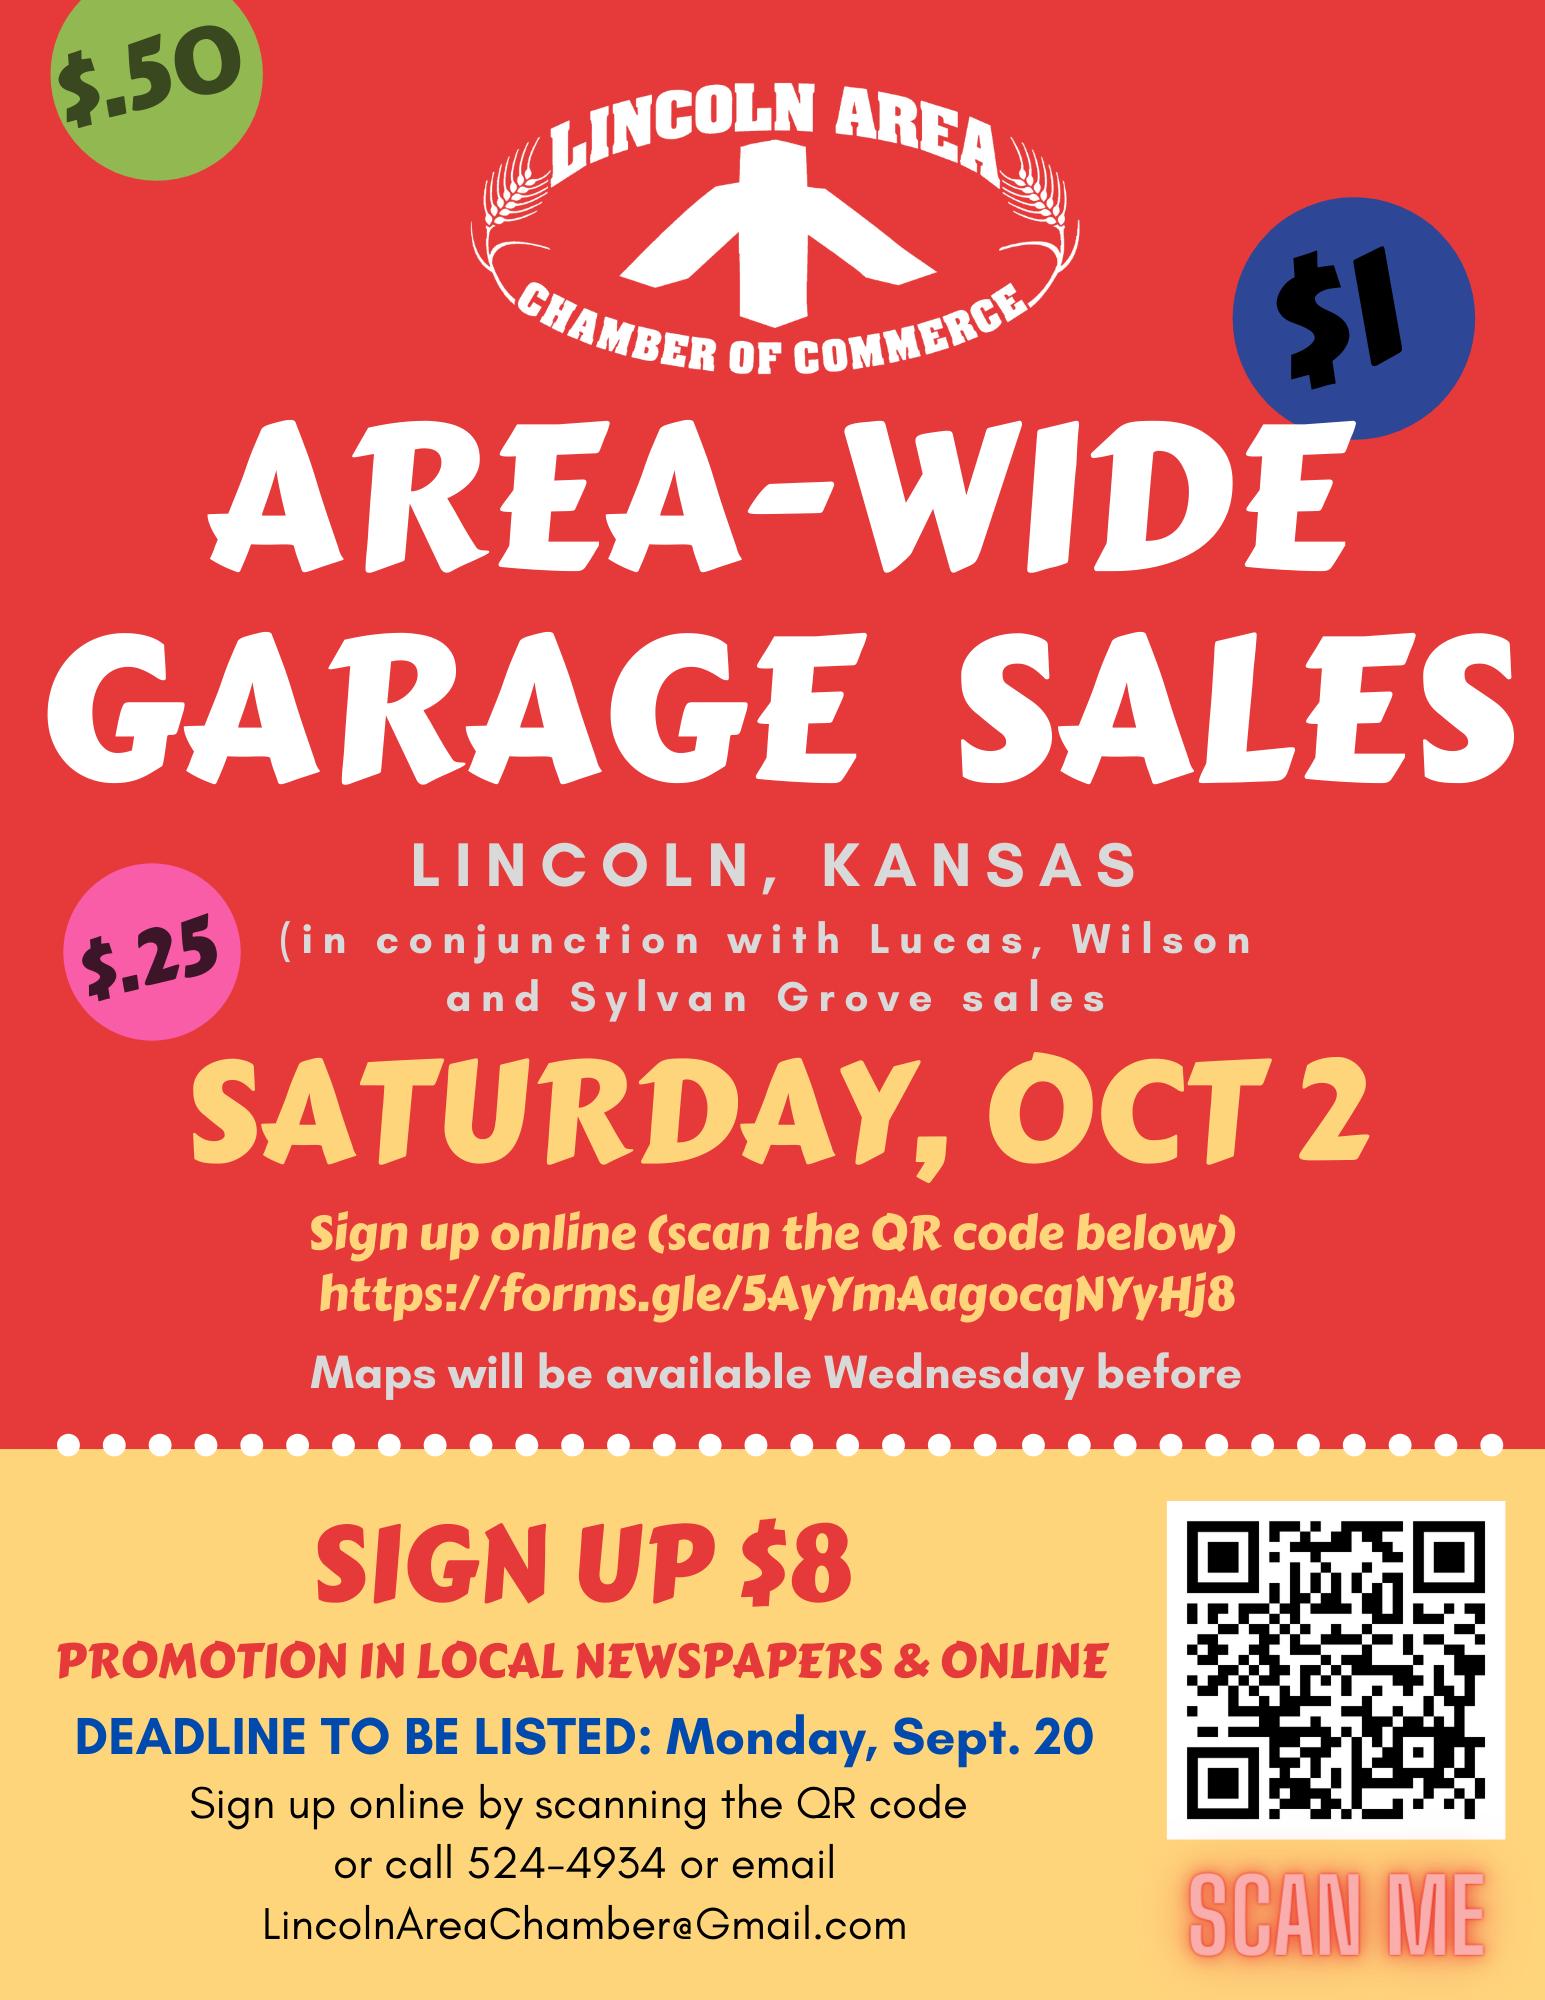 Fall Area-Wide Garage Sales